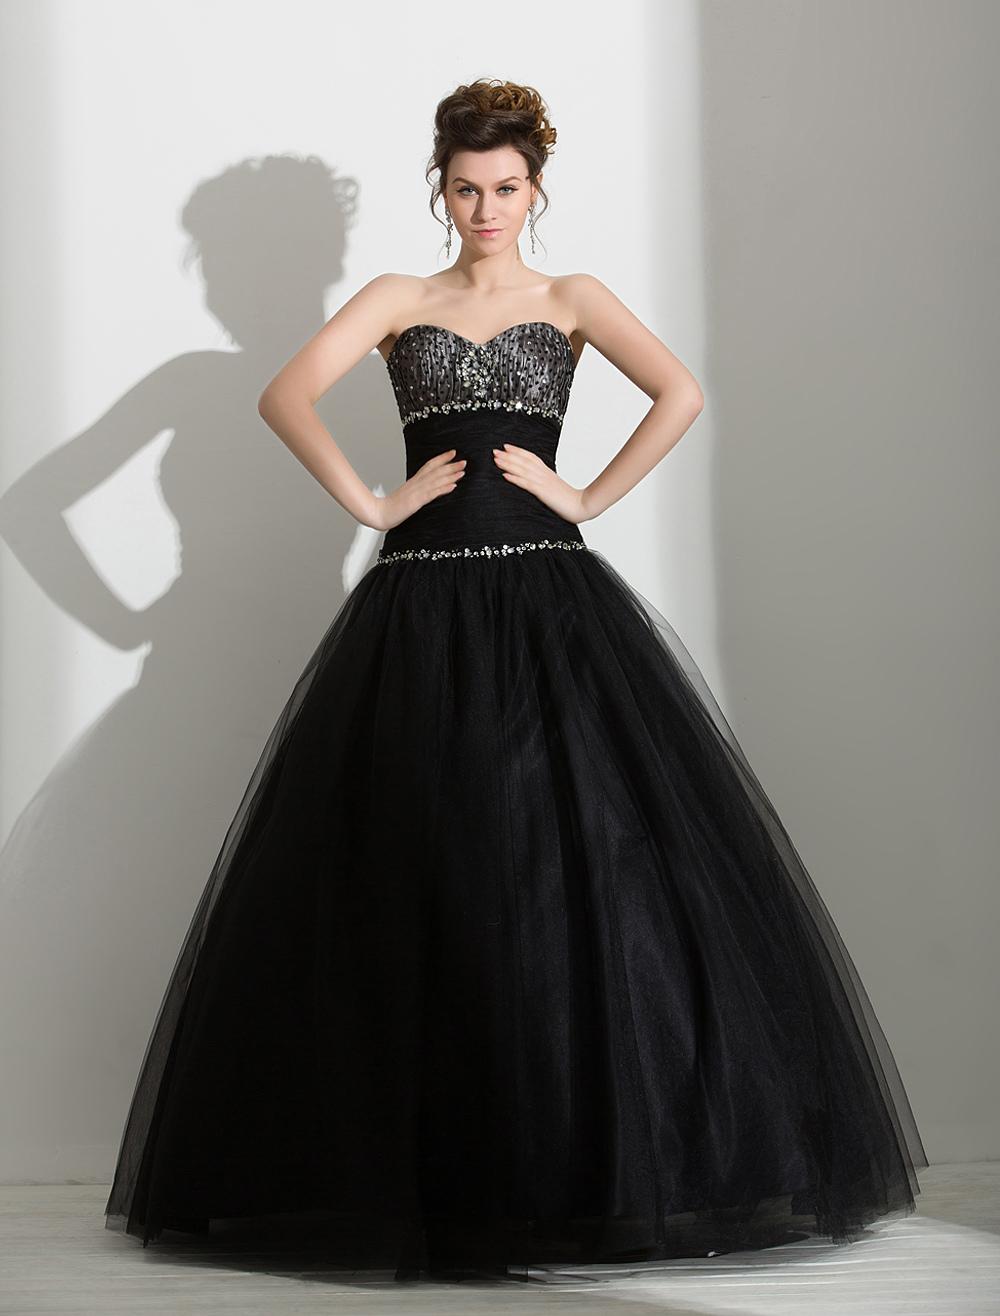 Black Wedding Dress Rhinestone Beaded Sweetheart Organza Floor-Length Ball Gown